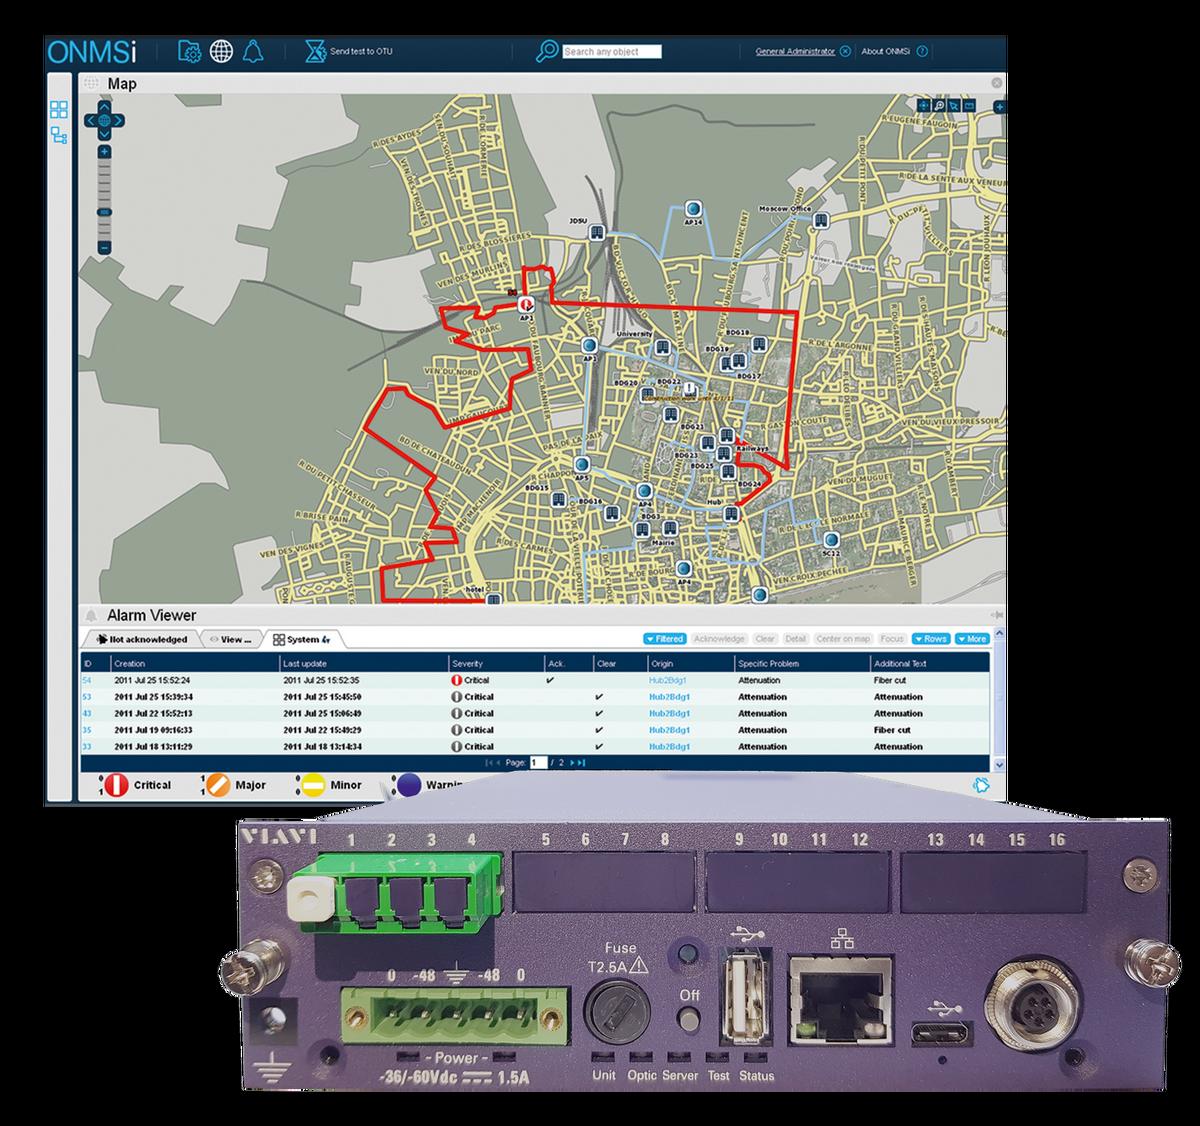 VIAVI ONMSi  Remote Fiber Test System (RFTS)